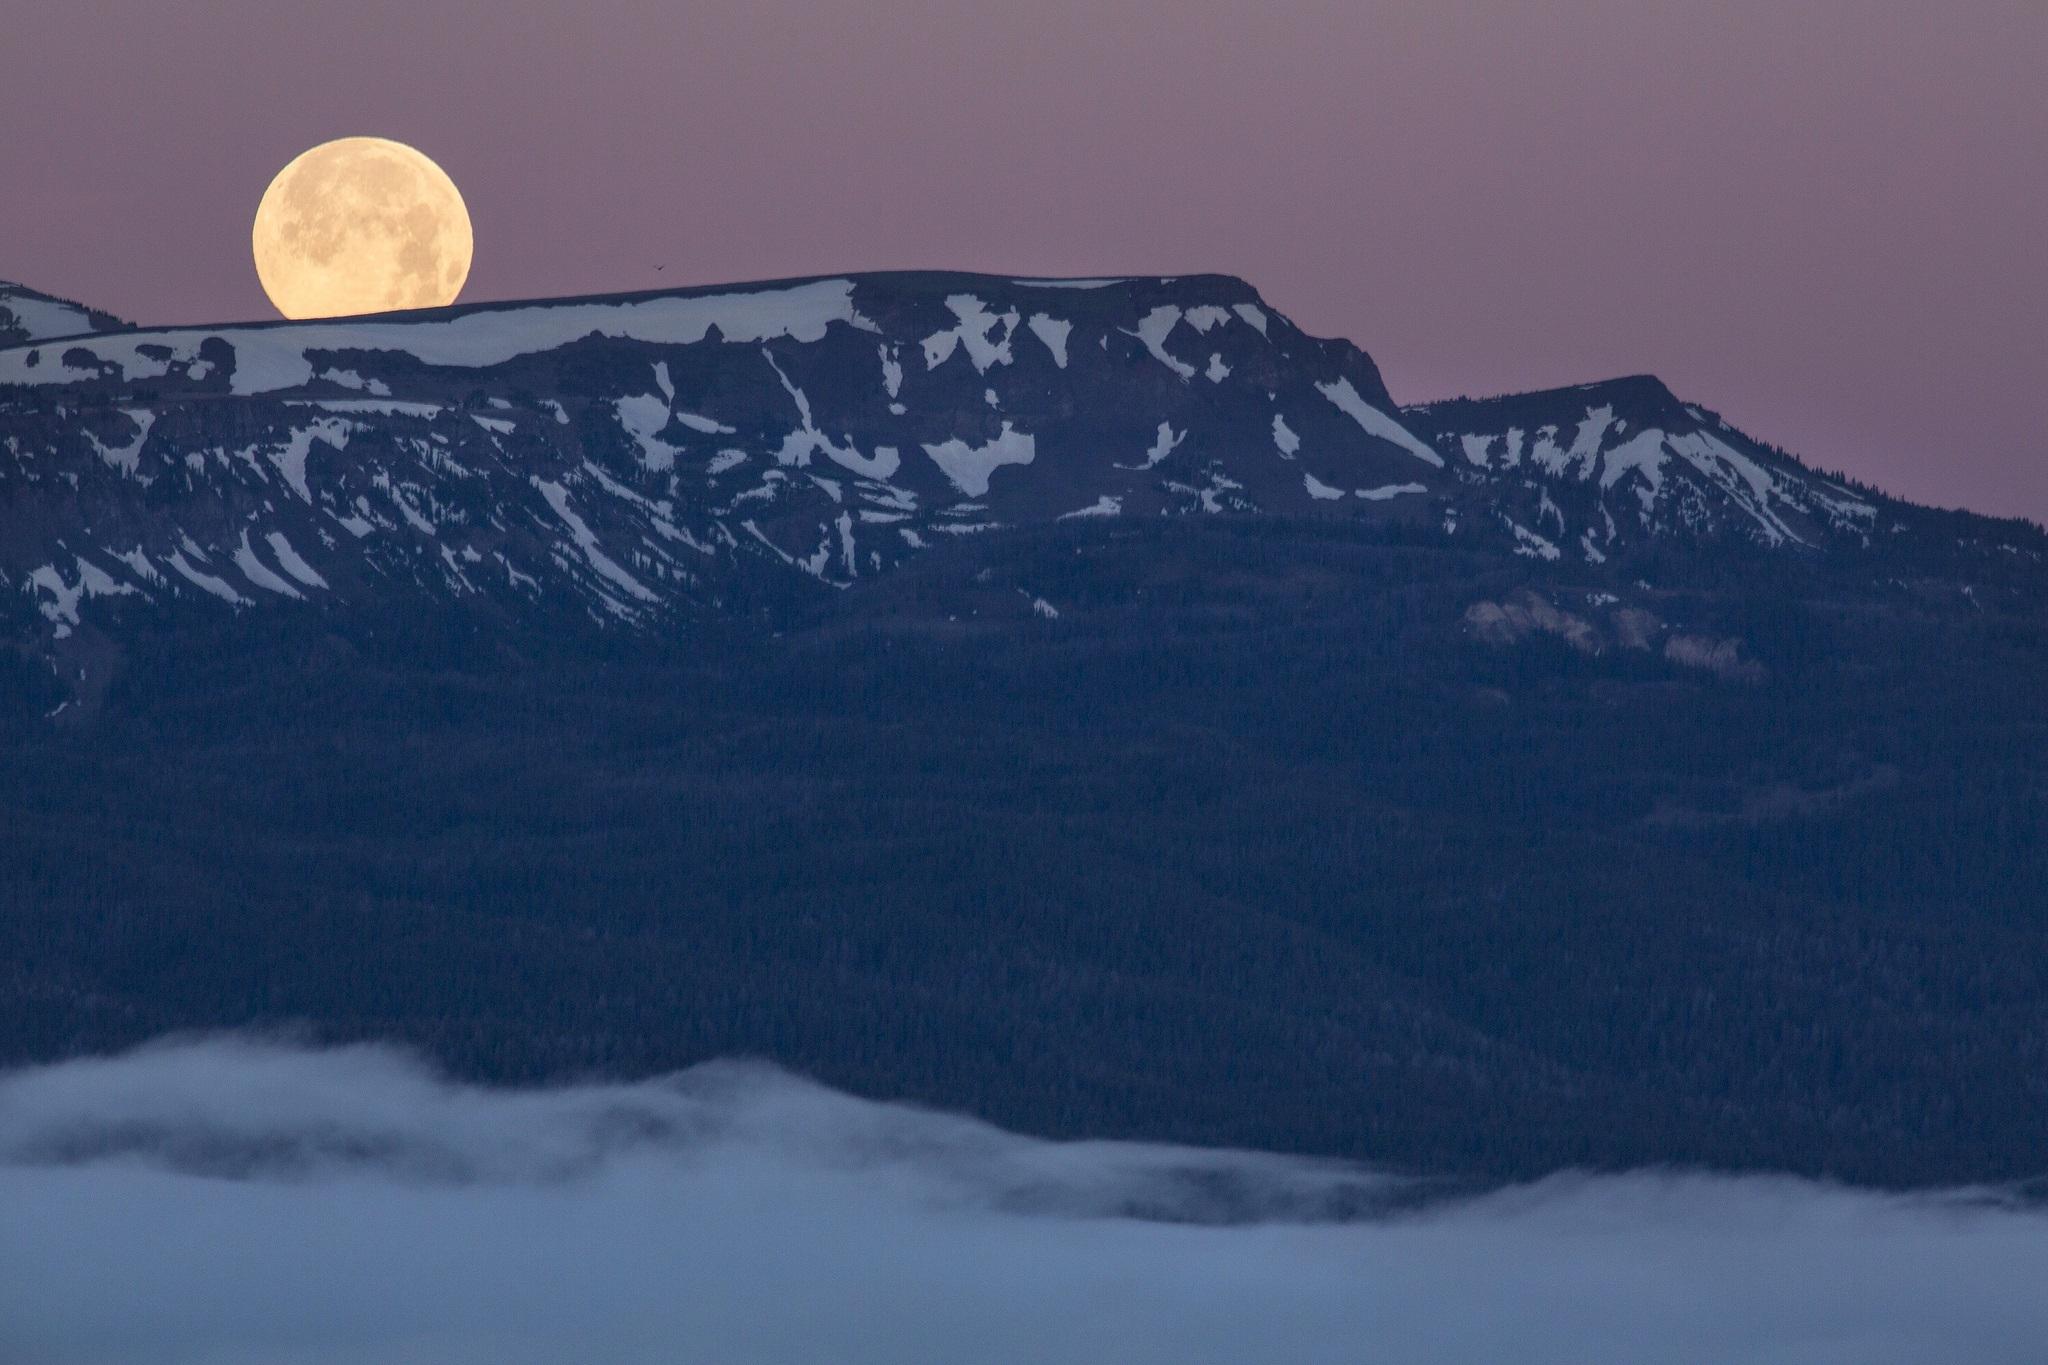 Full Moon, Full, Landscape, Moon, Mount, HQ Photo